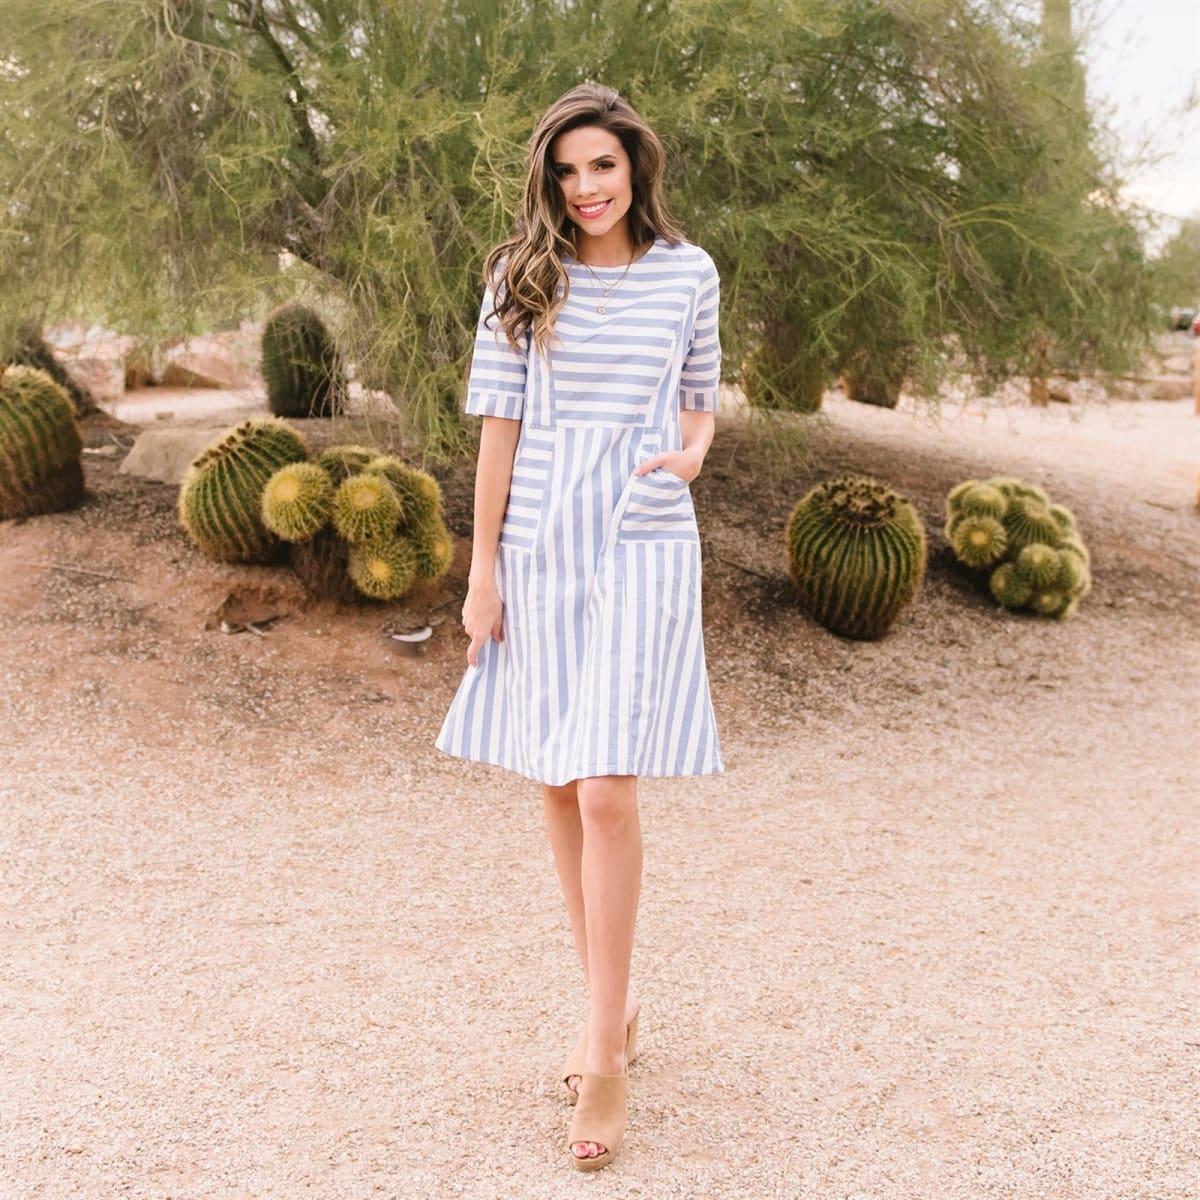 Summer dresses: woman wearing a blue & white striped dress